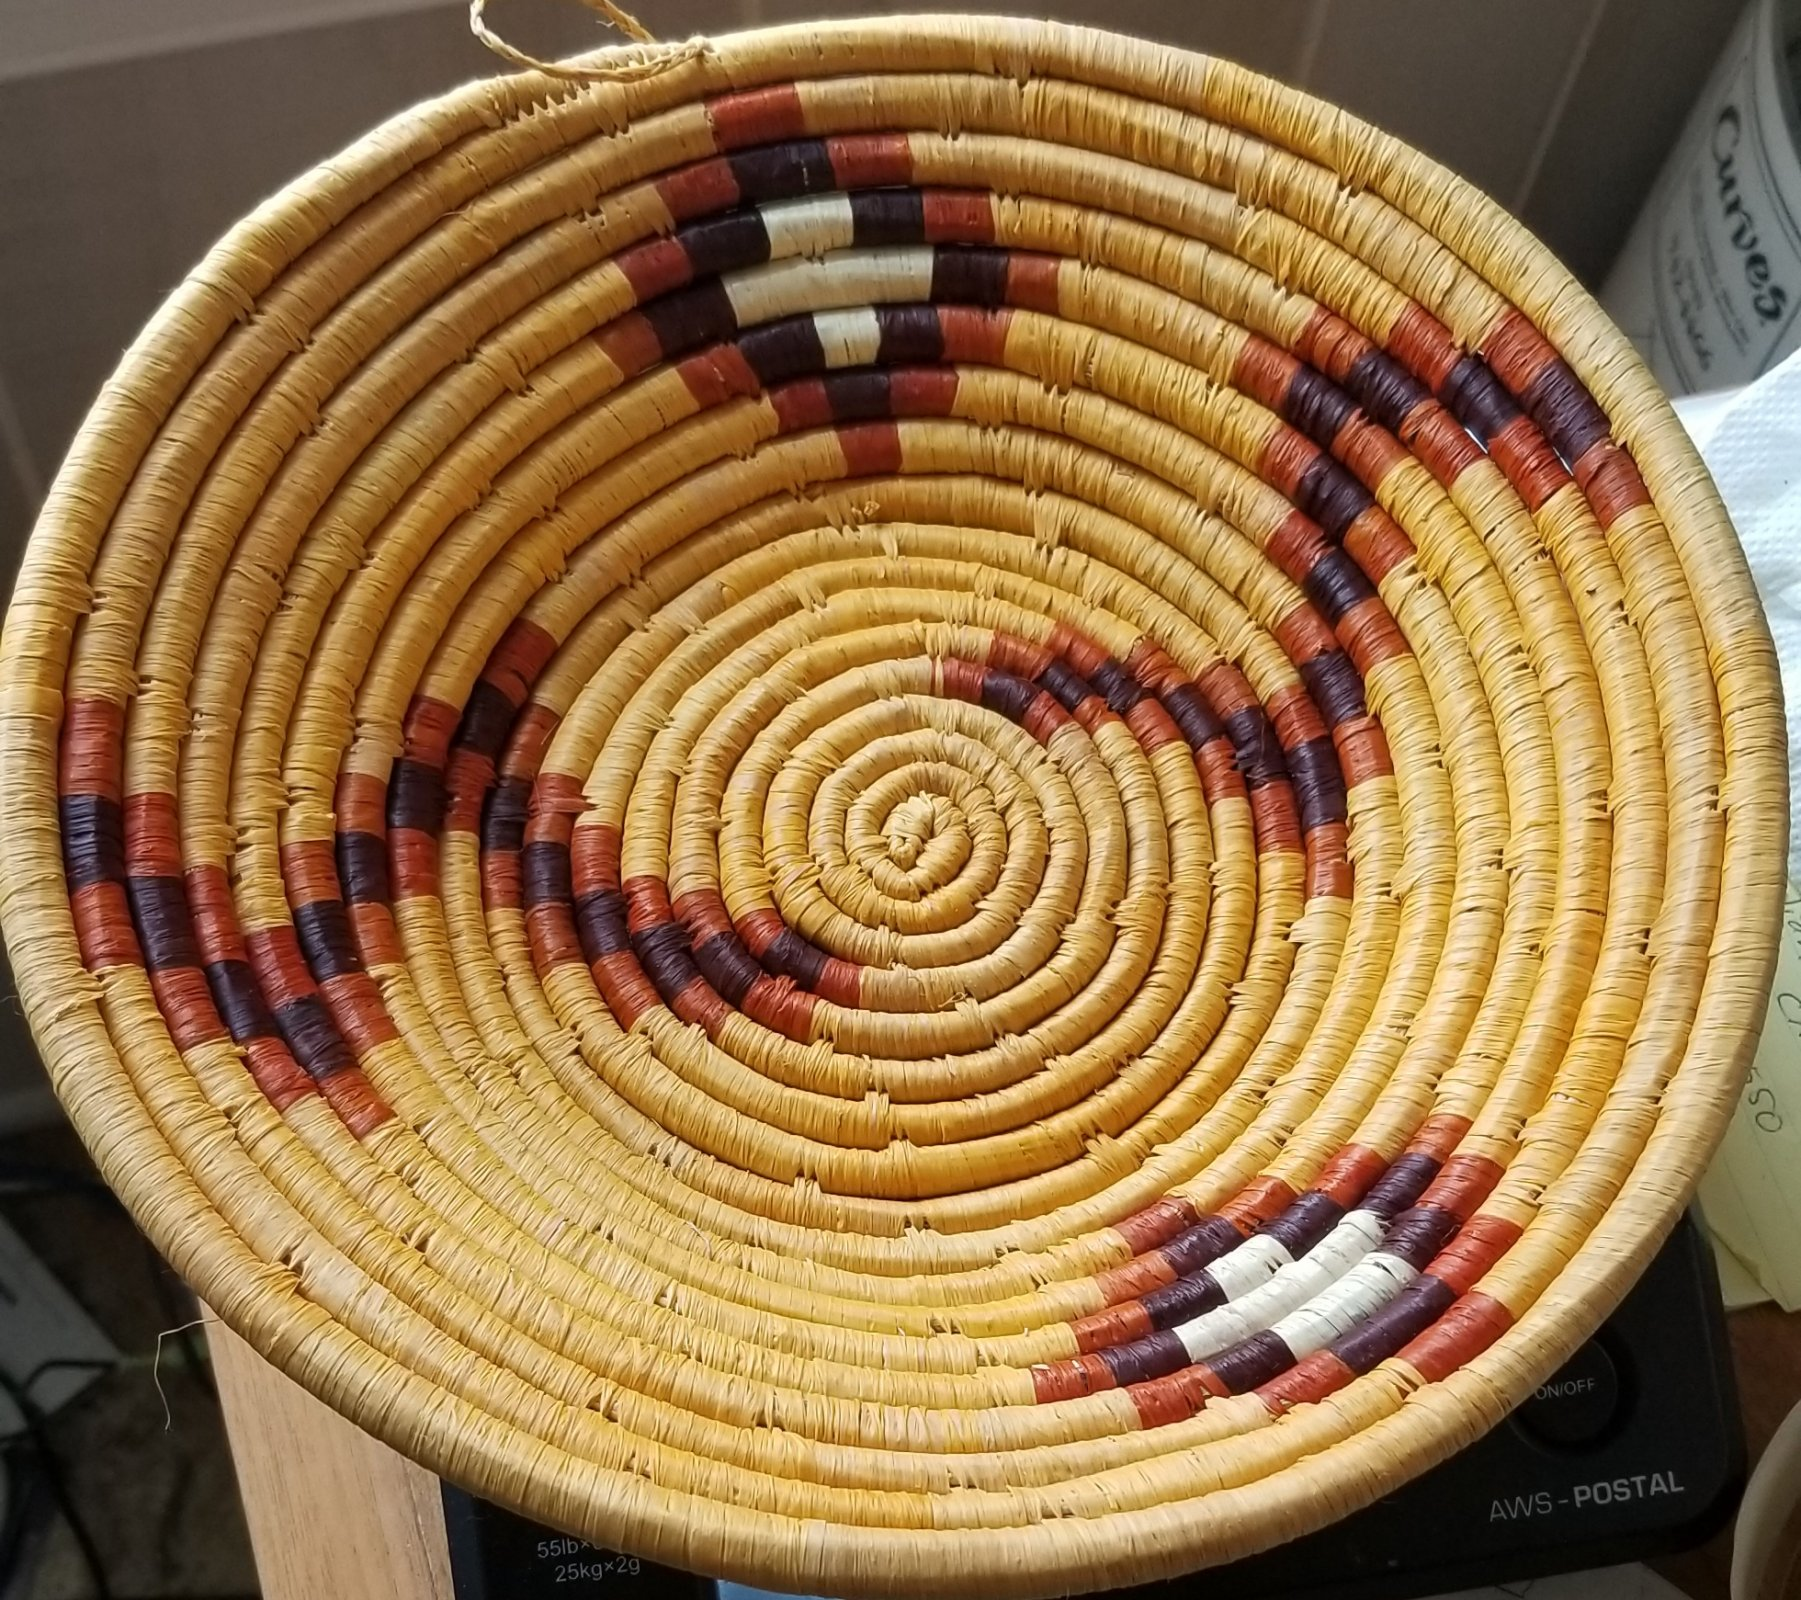 10 Uganda Basket Multi-Colored Small #004